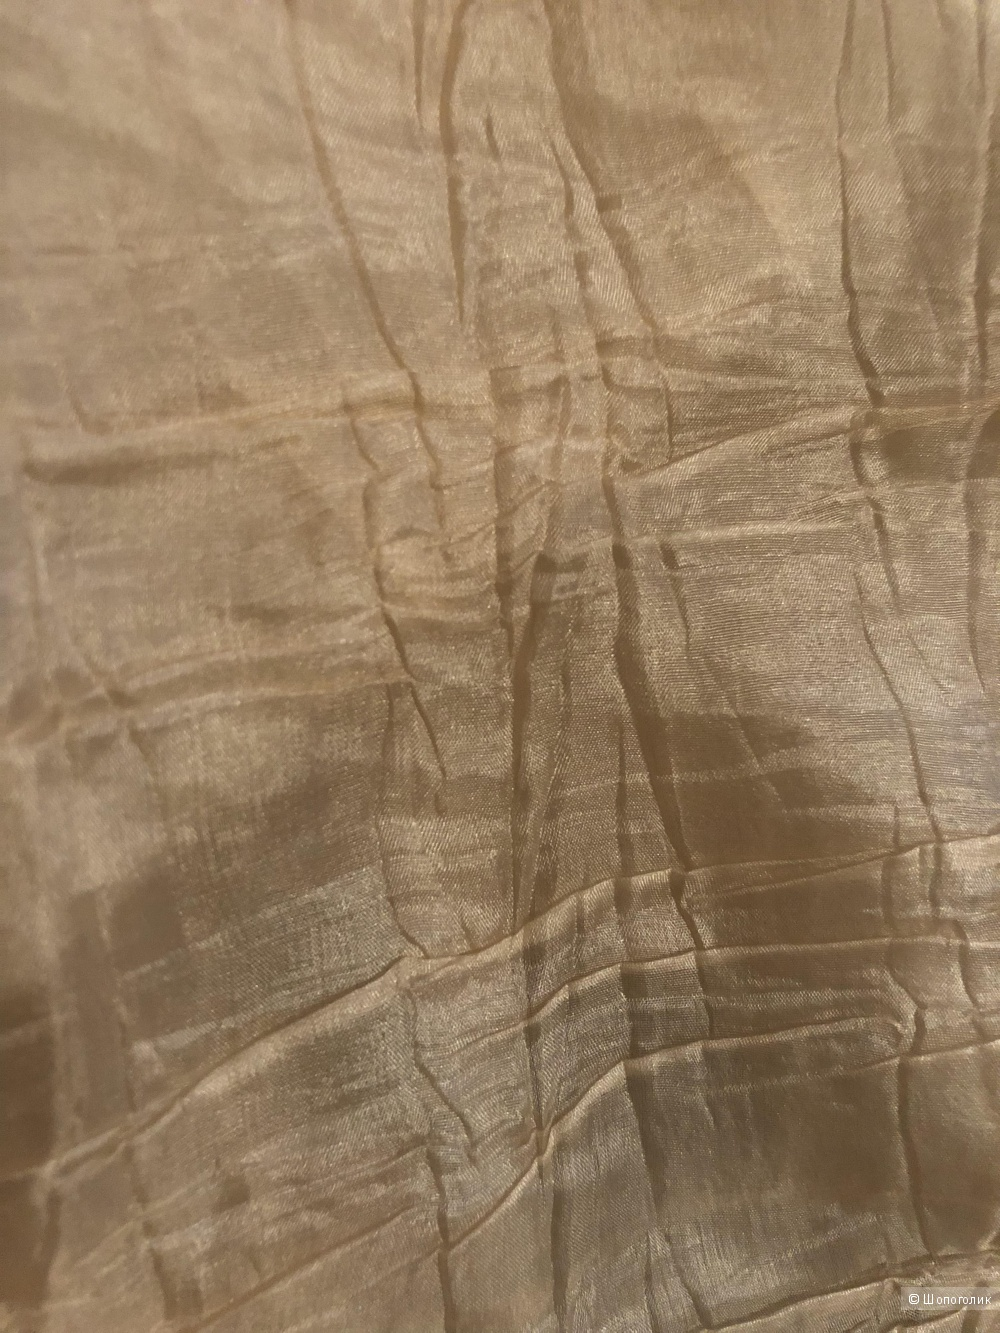 Палантин из жатого шелка бренд PENNYBLACK , длина 140, ширина 115